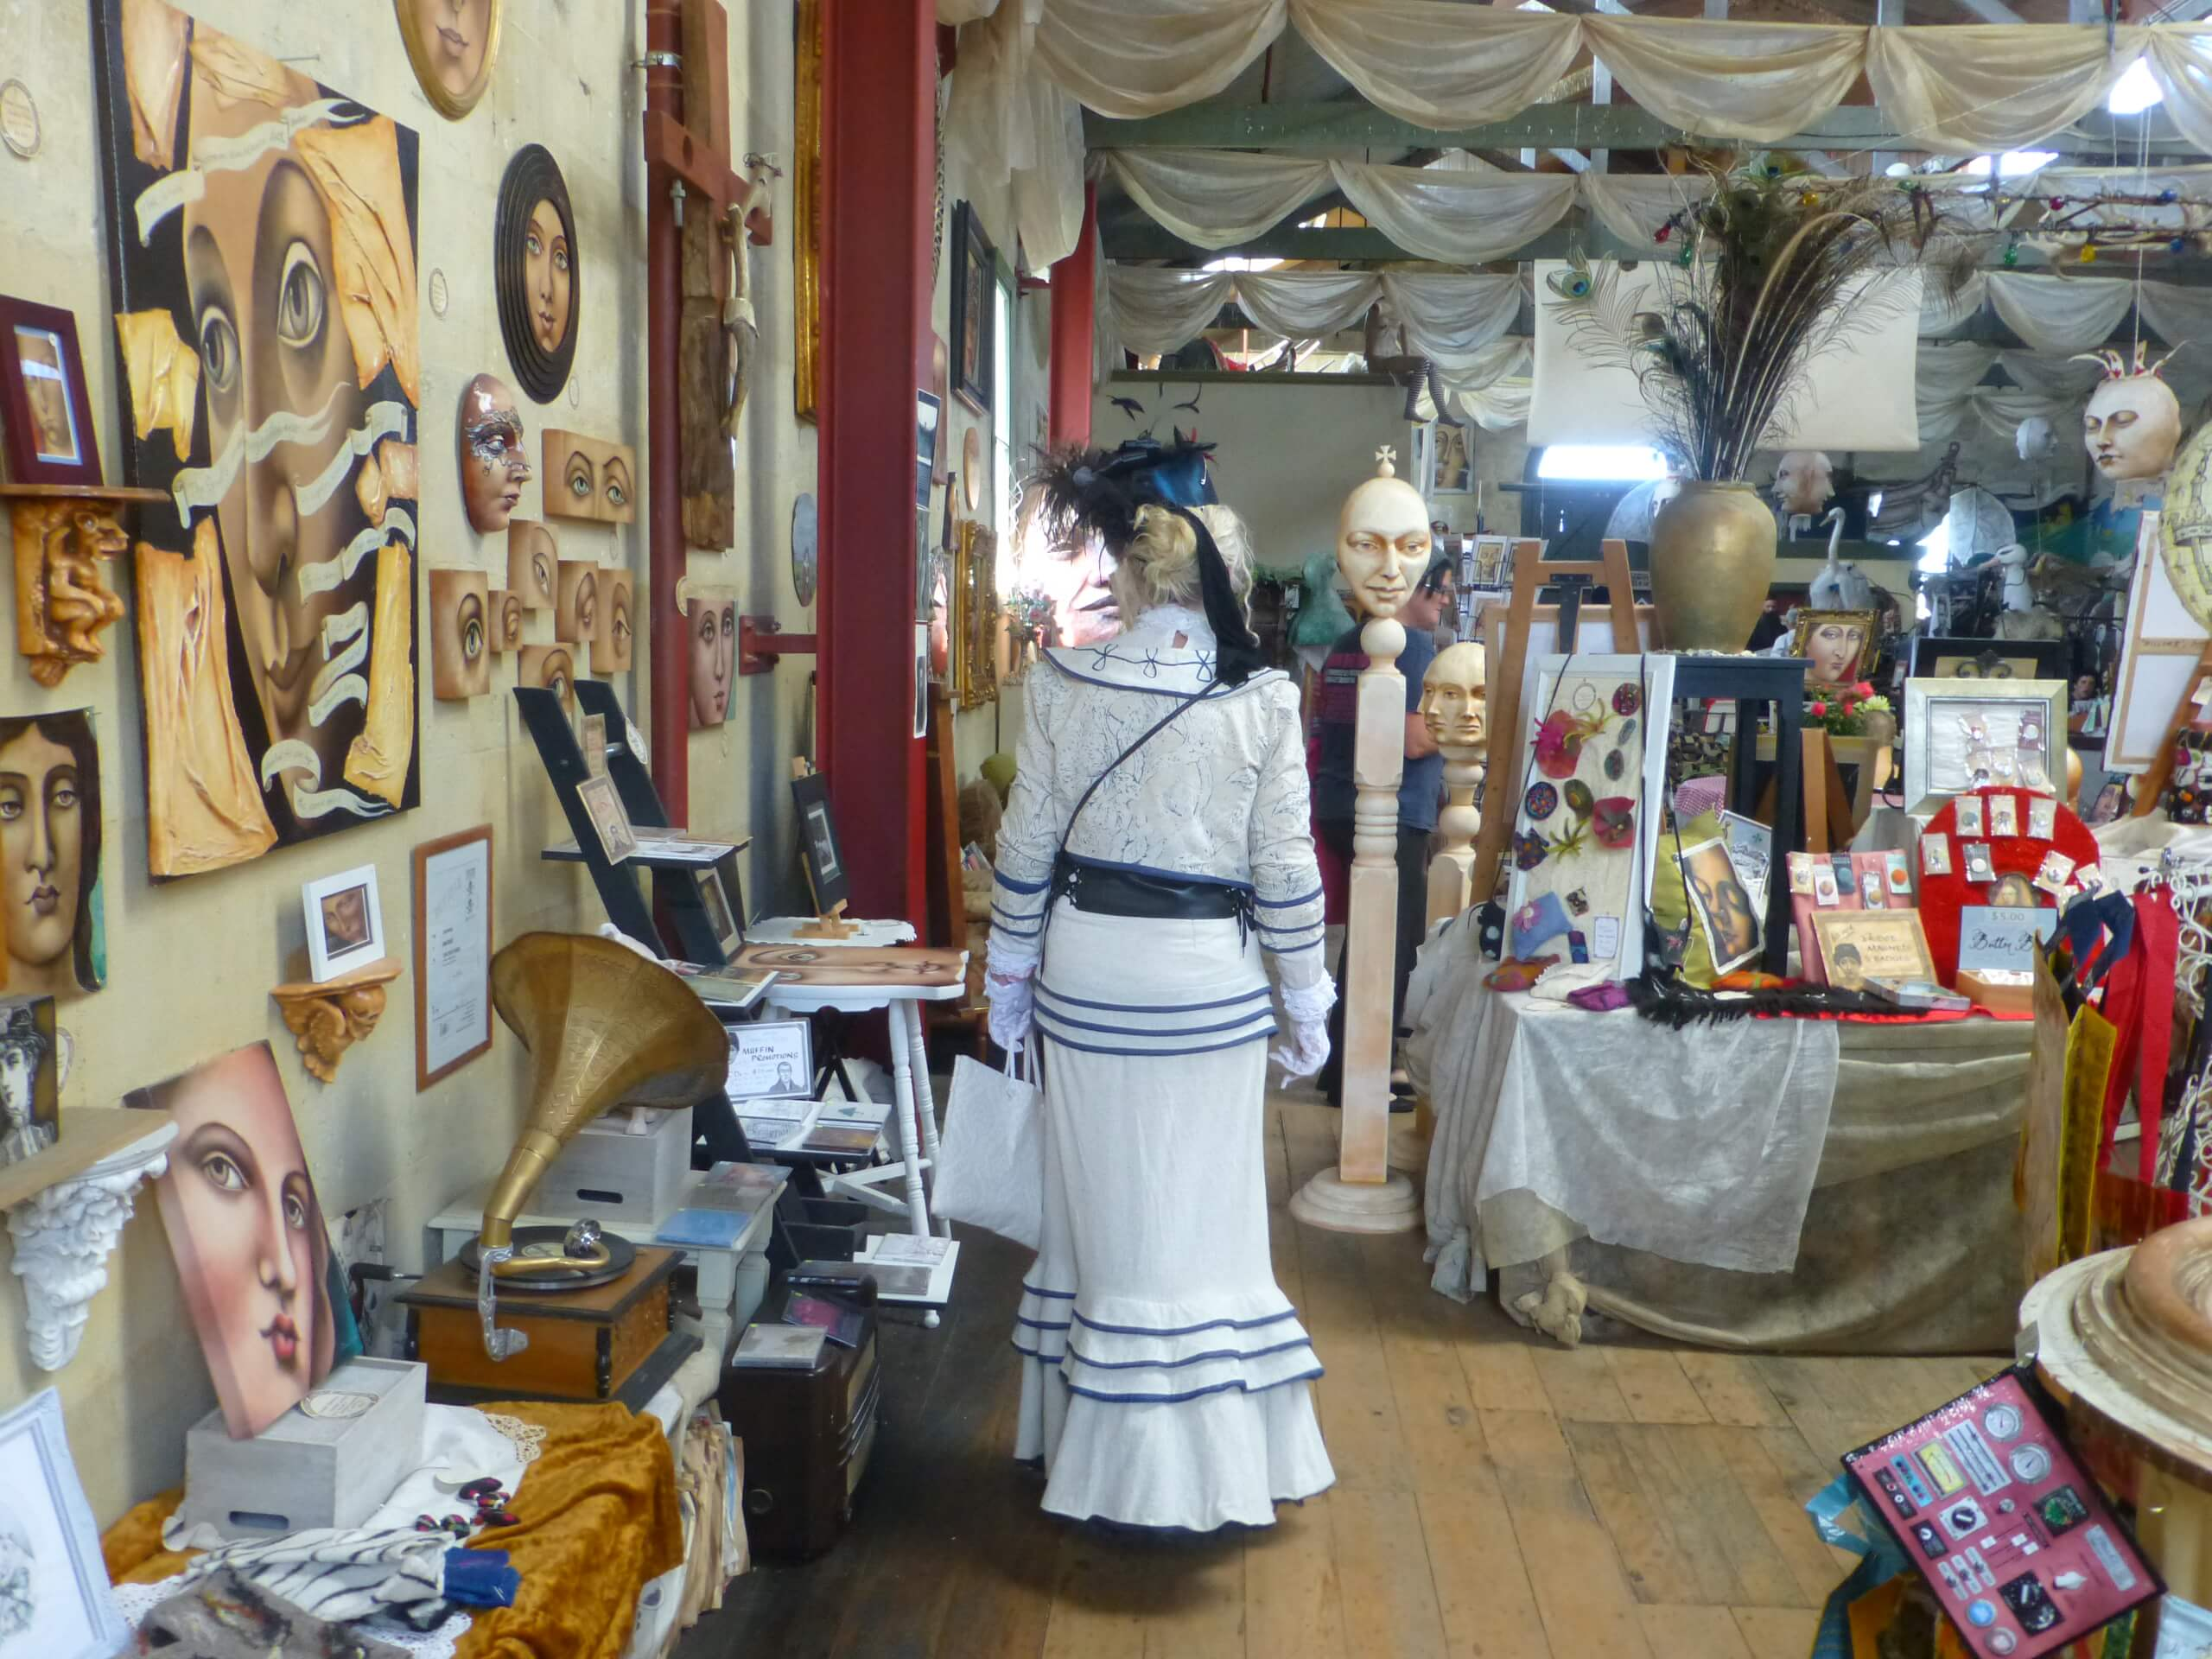 Grainstore Gallery, Oamaru 15